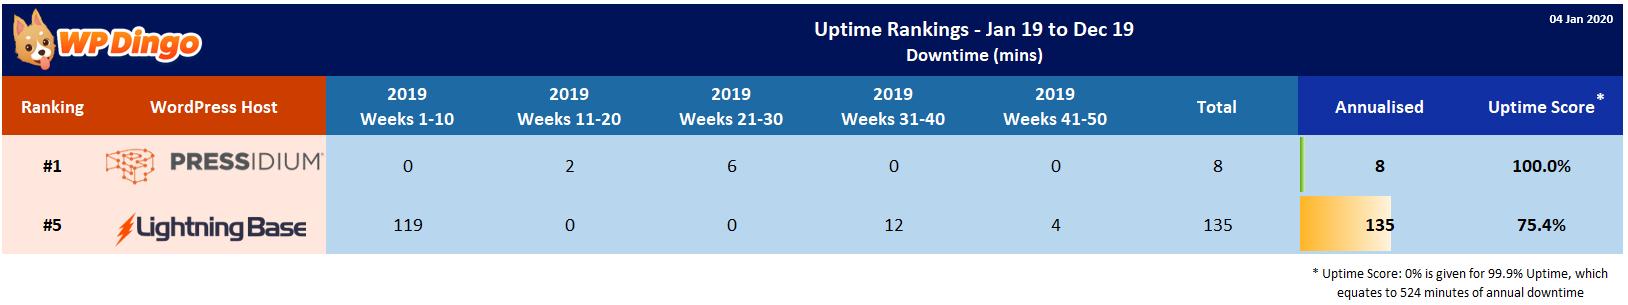 Lightning Base vs Pressidium 2019 Uptime Test Results